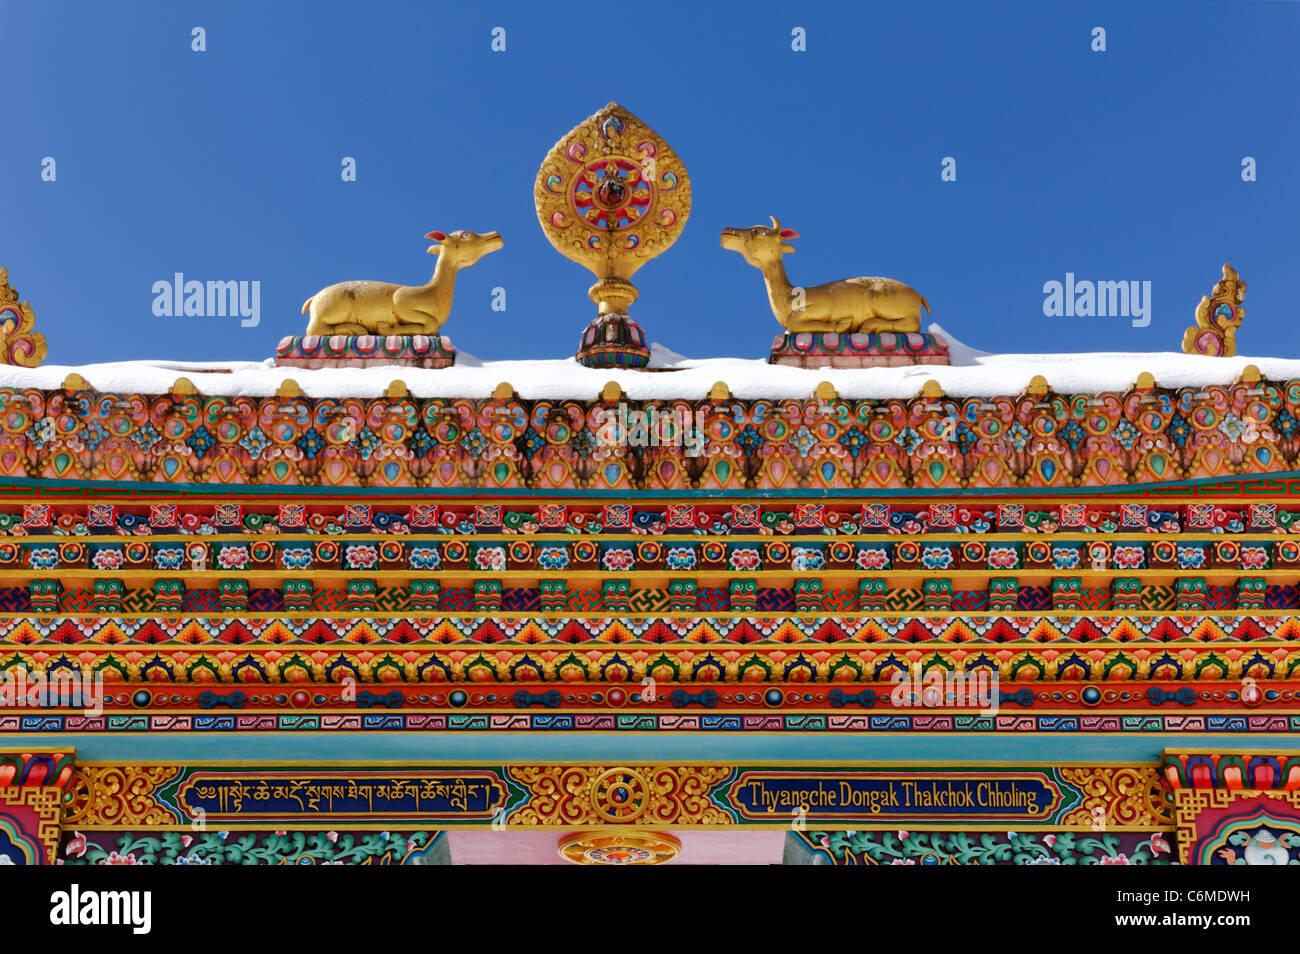 The buddhist Tengboche Monastery, Everest Region, Nepal - Stock Image